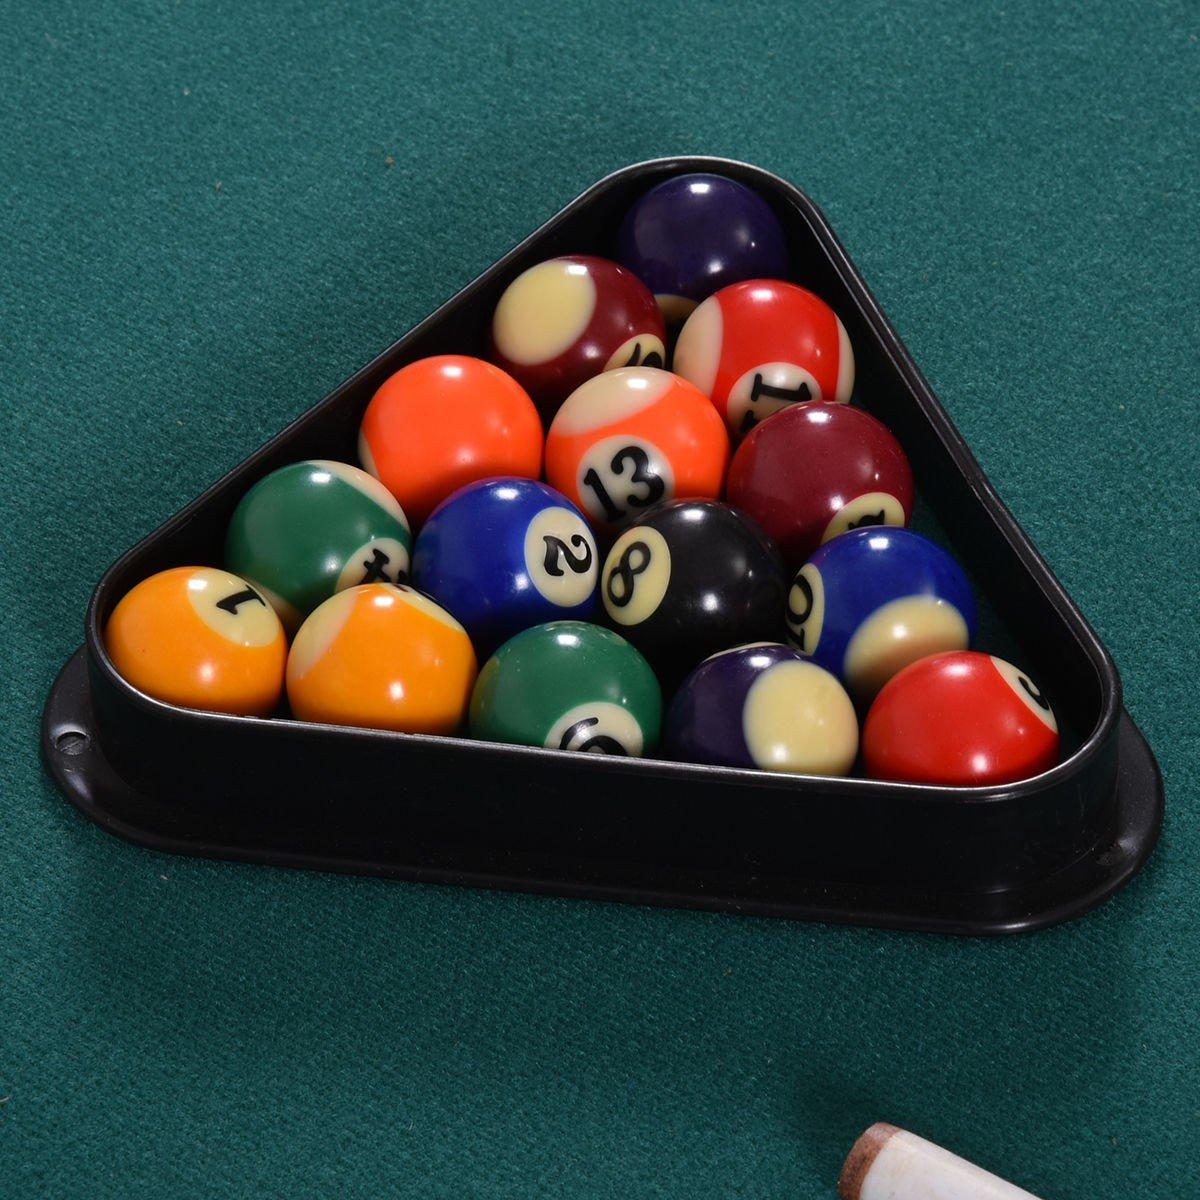 36\u201d Mini Table Top Pool Table Game Billiard Set Cues Balls Gift Indoor Sports & 36\u201d Mini Table Top Pool Table Game Billiard Set Cues Balls Gift ...